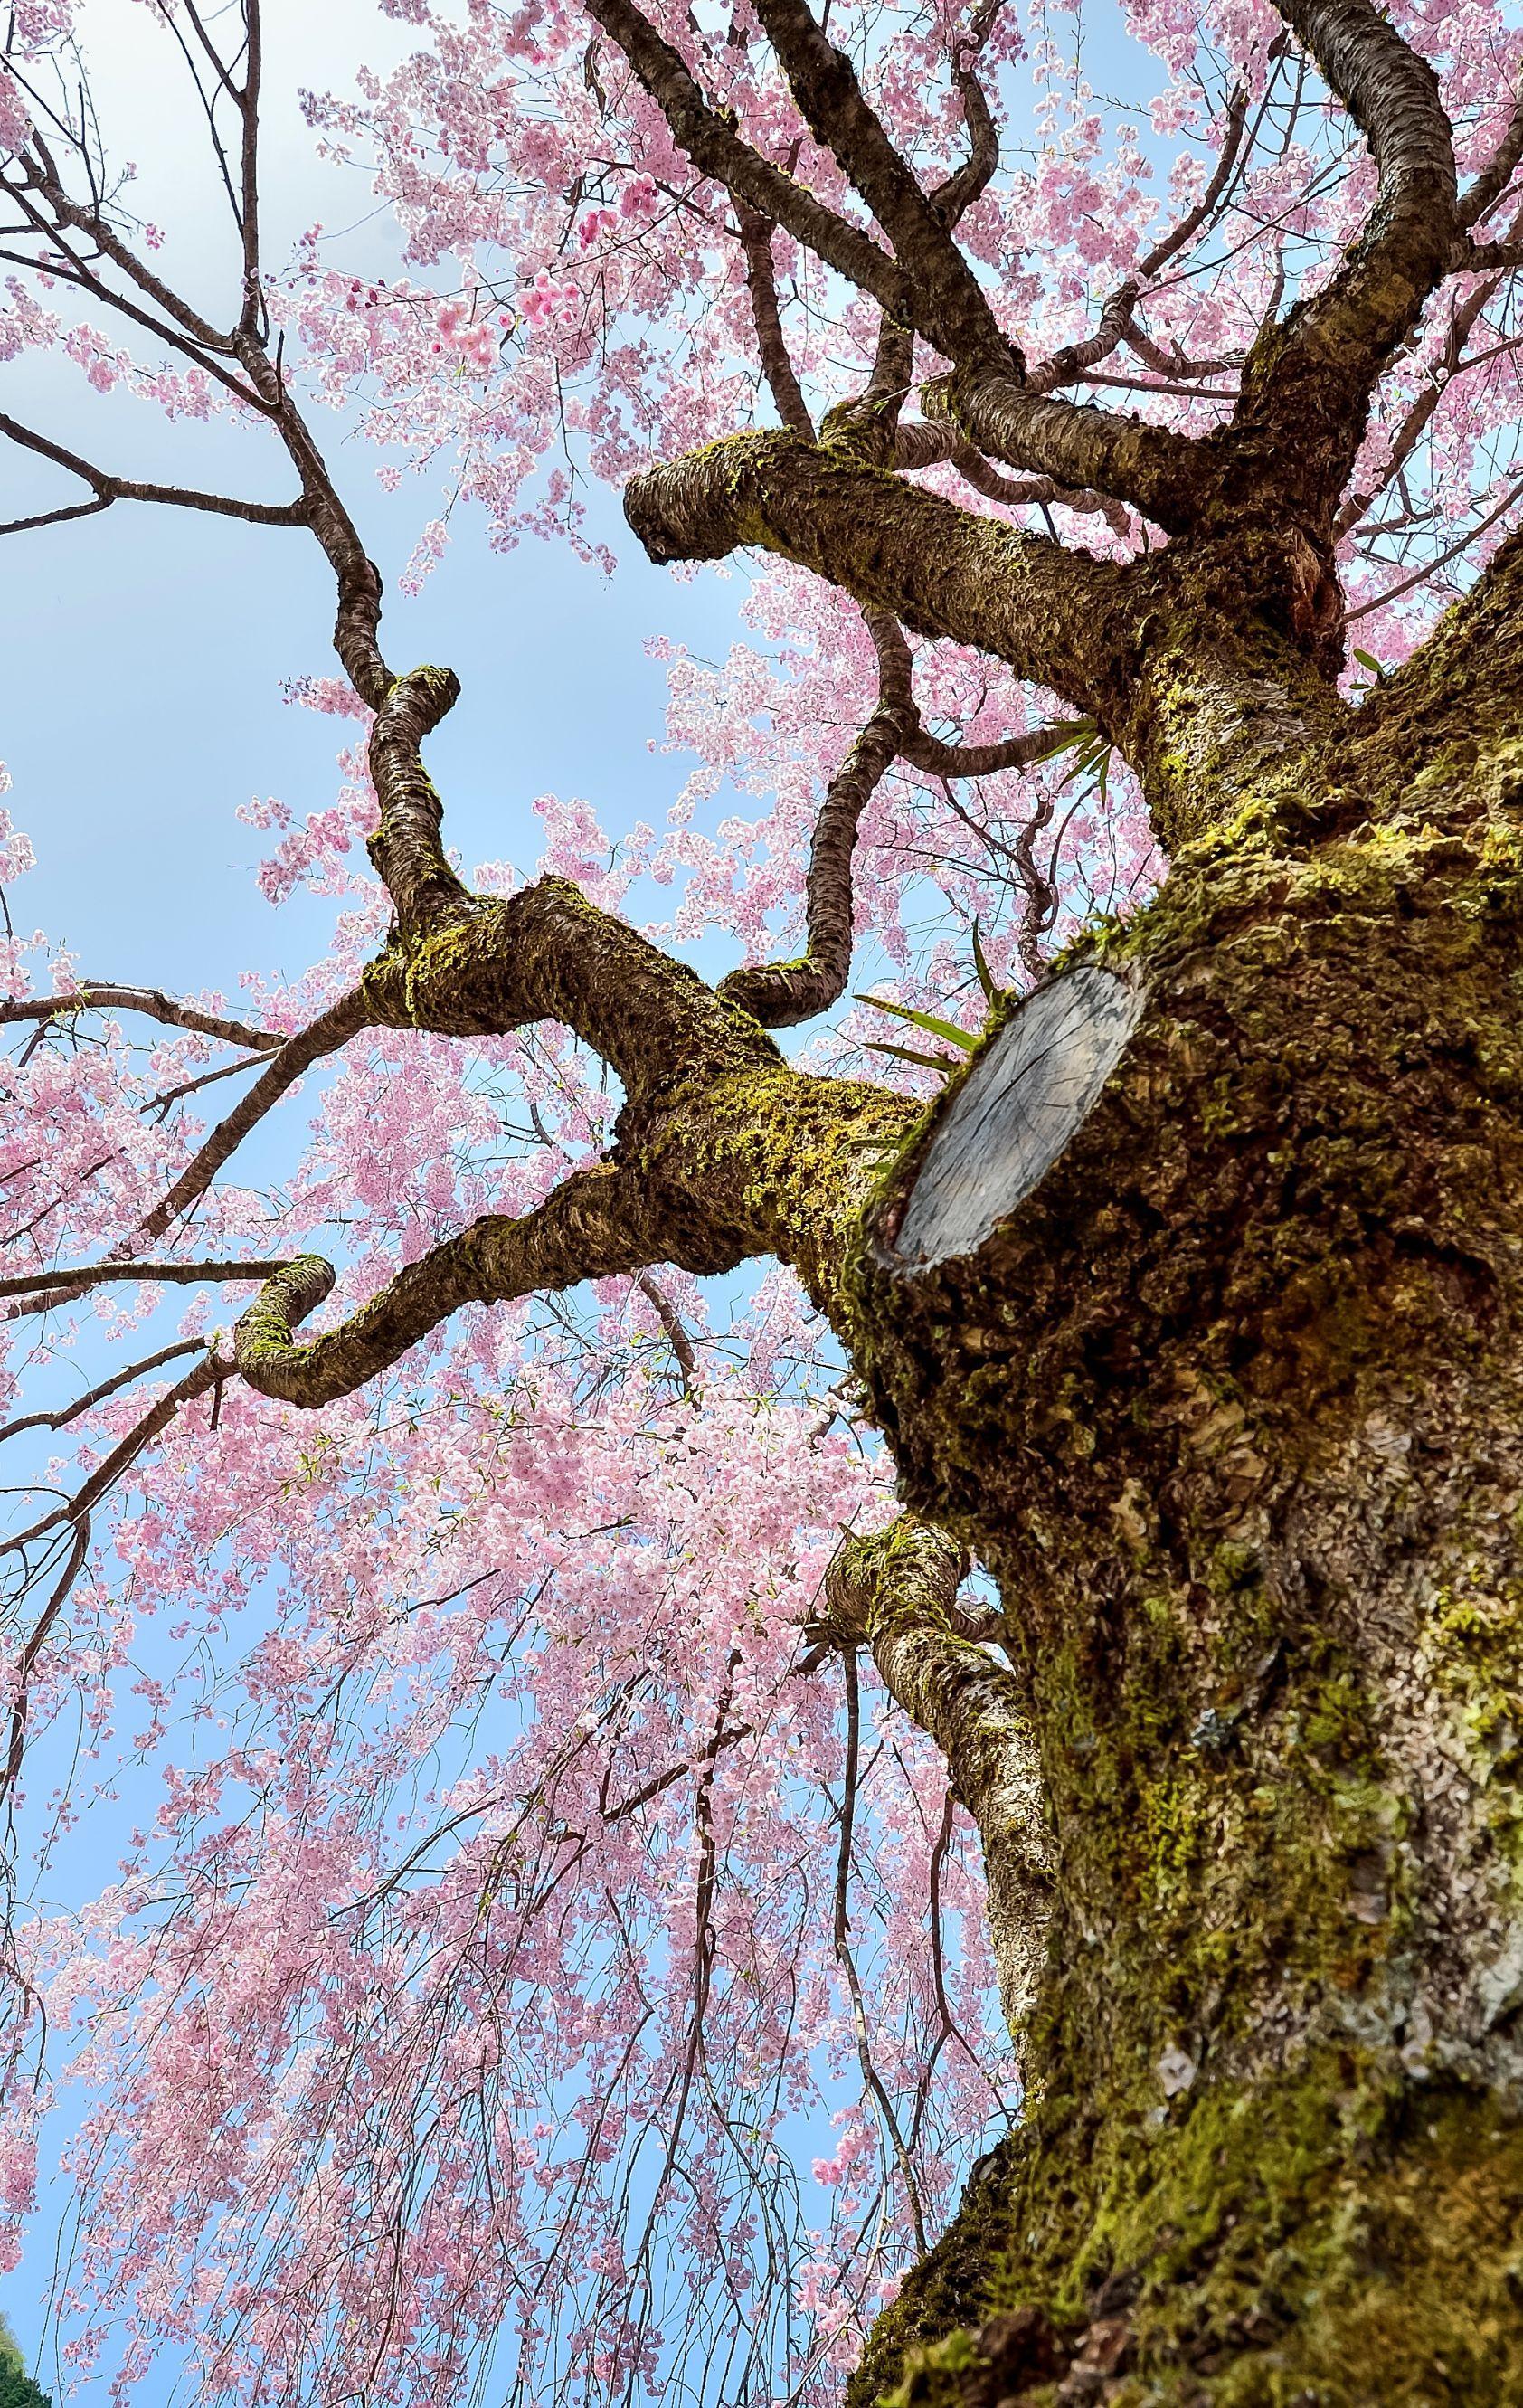 Cherry Blossom Japan Cherry Blossom Japan Japanese Cherry Cherry Blossom